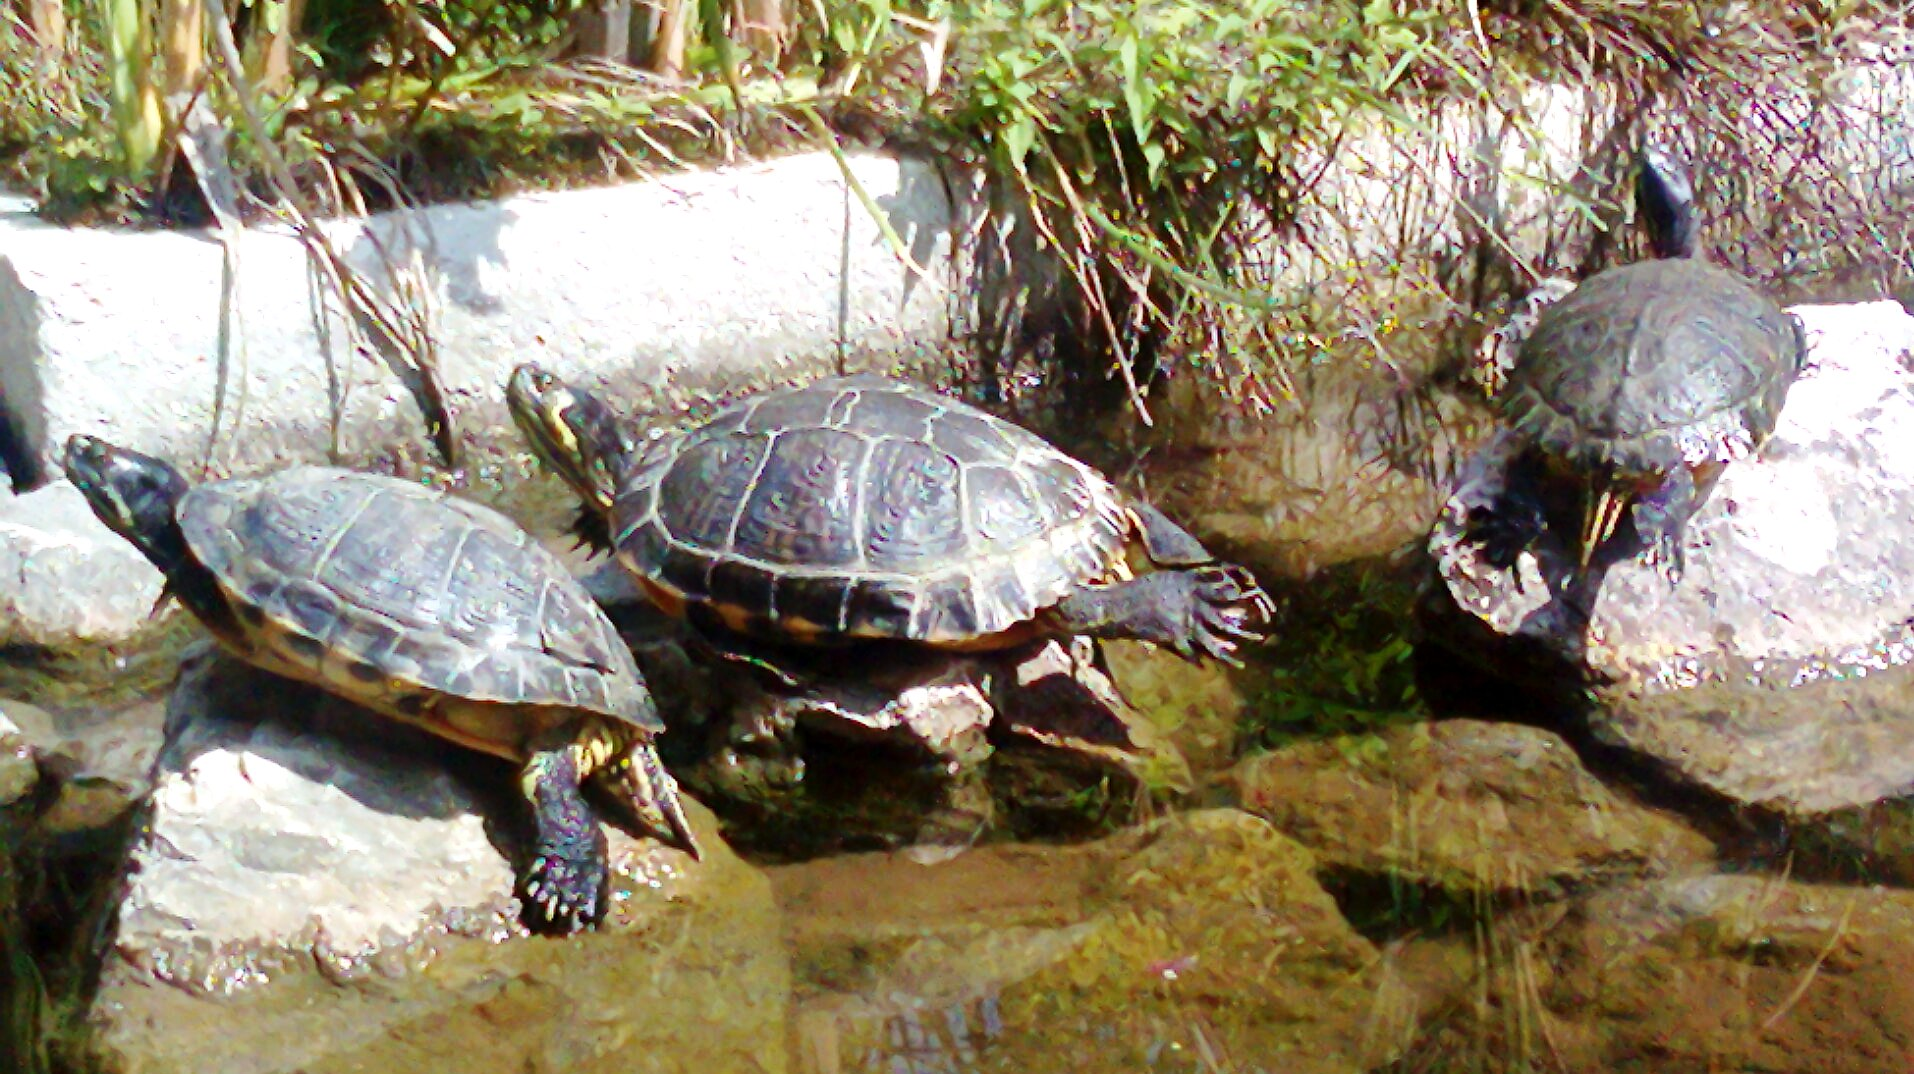 Storie di tartarughe e altri strani amici for Termoriscaldatore per tartarughe